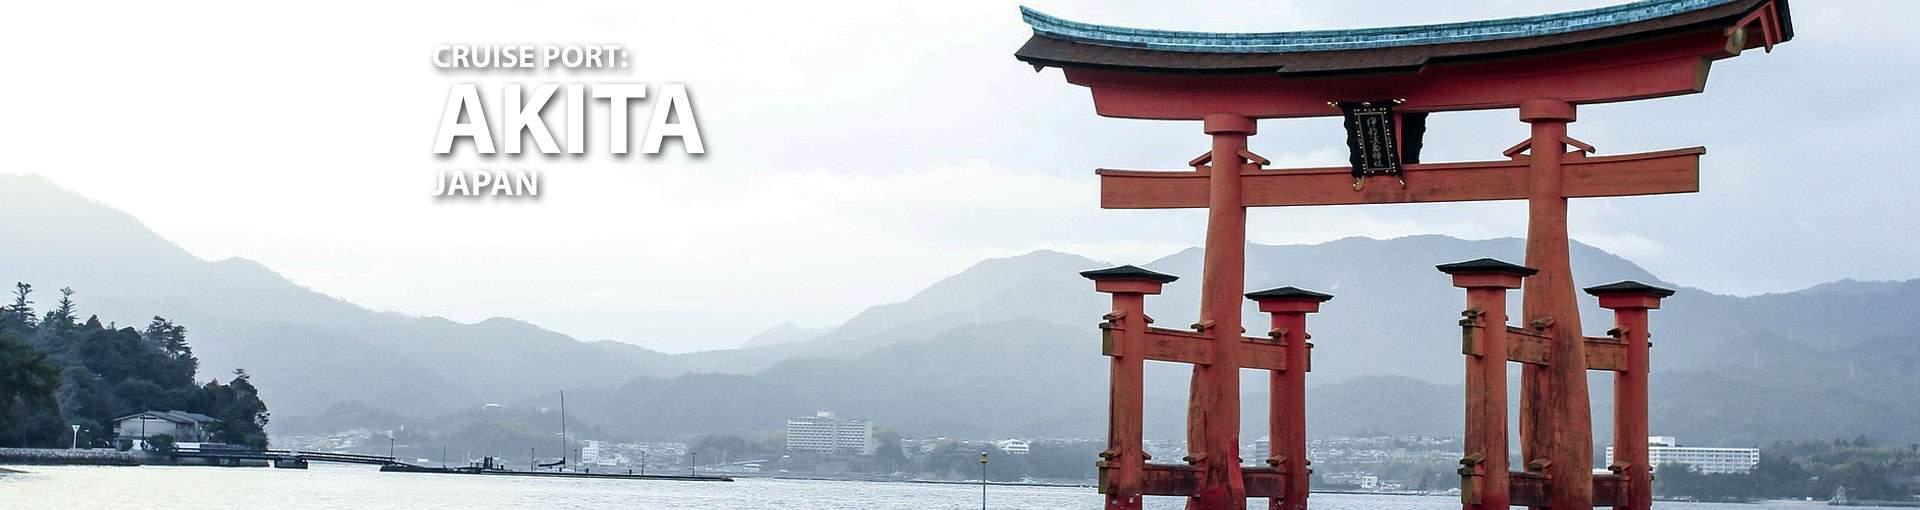 Akita, Japan Cruise Port